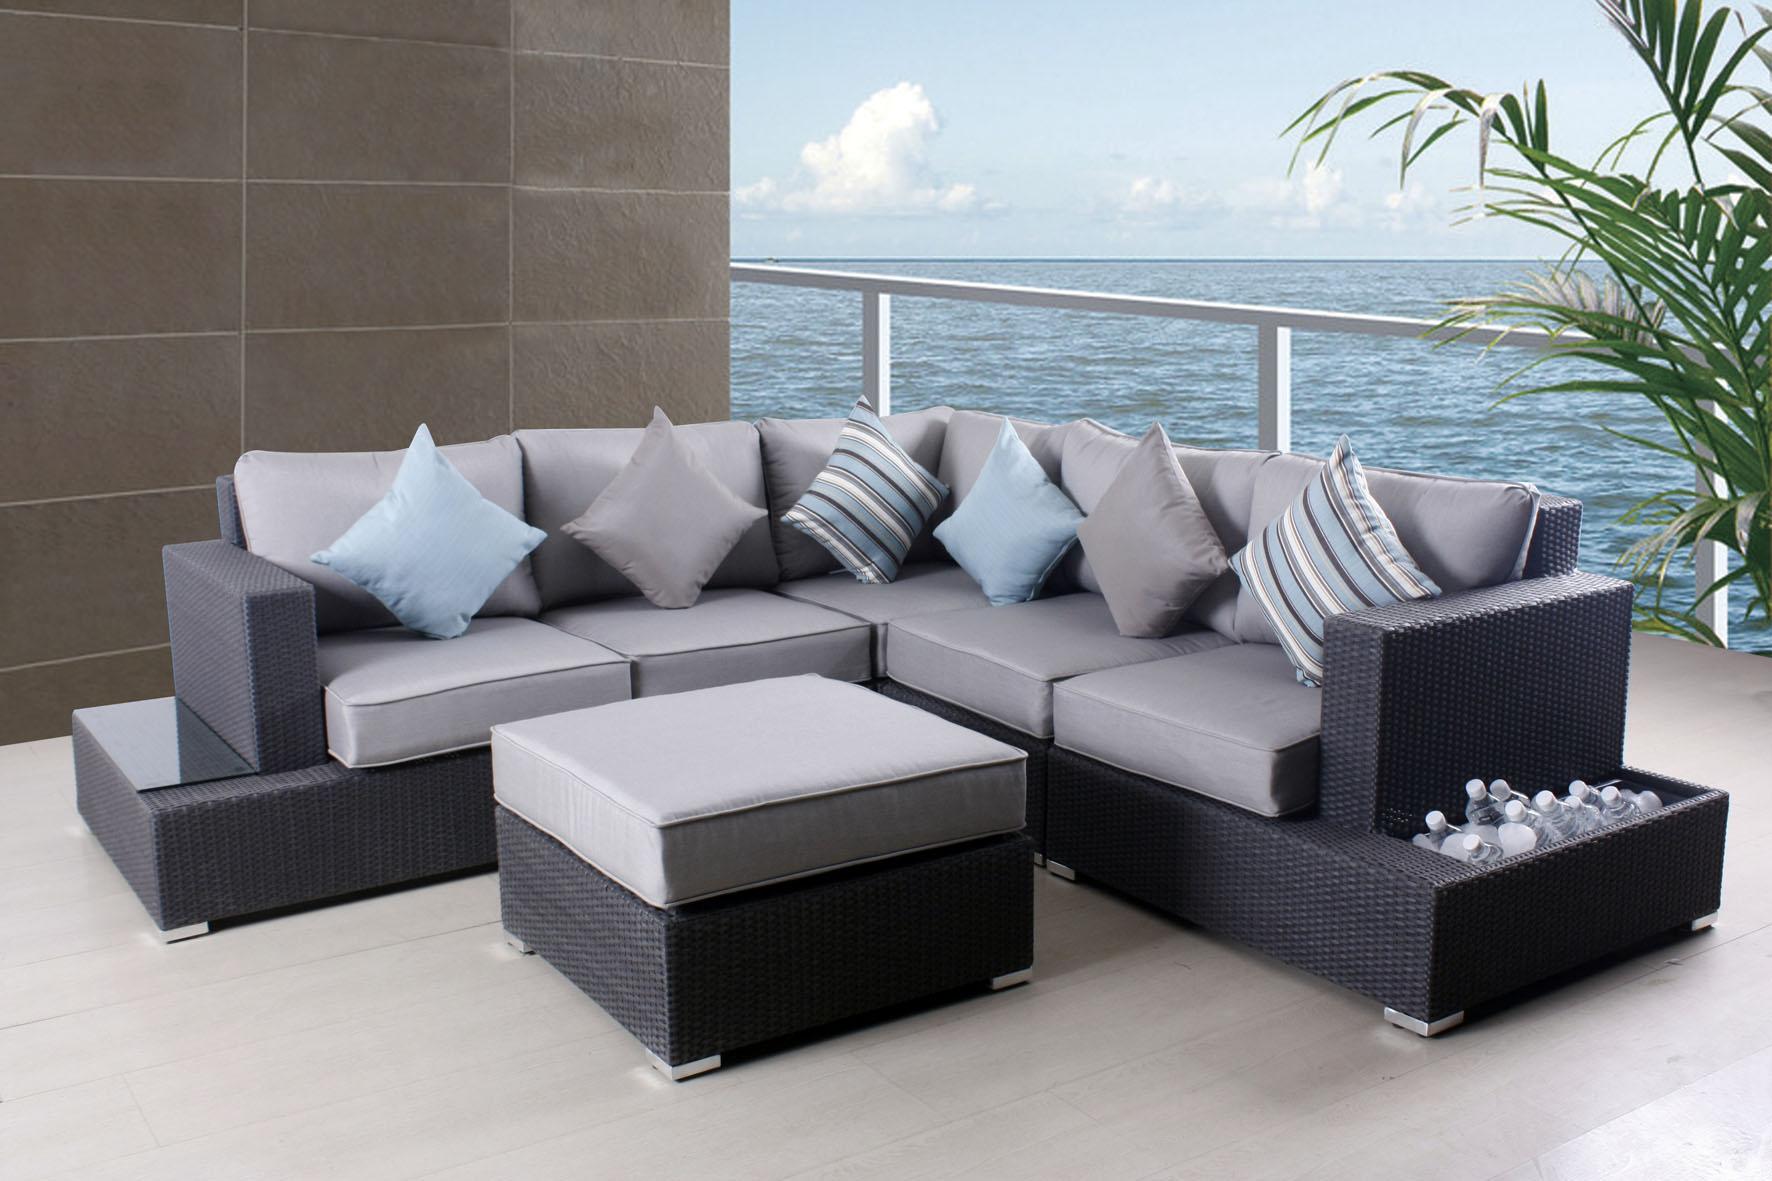 grey patio chair covers tufted desk australia kids outdoor furniture costco home decor